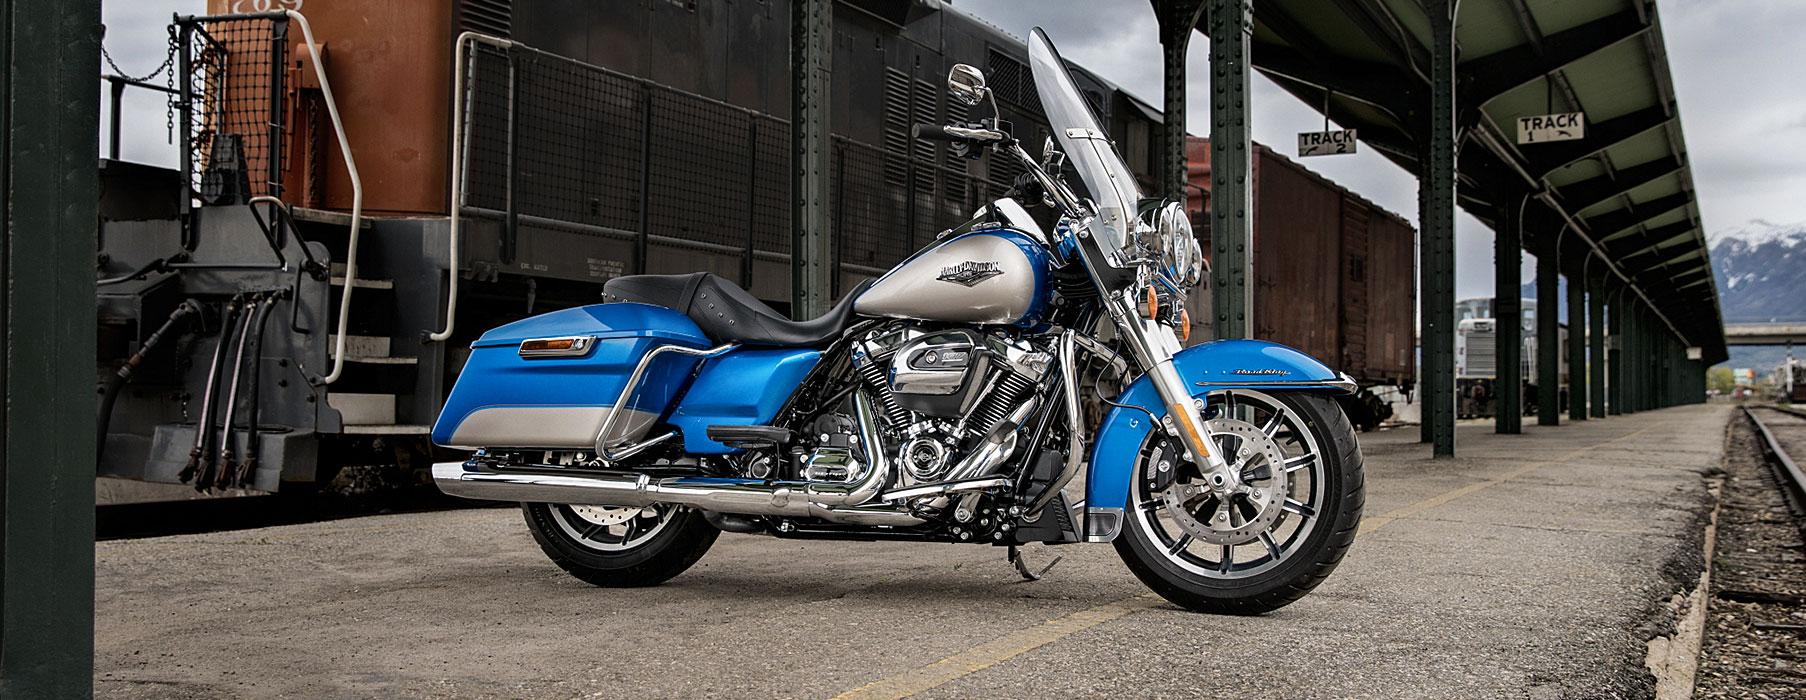 HARLEY-DAVIDSON FLHR ROADKING 2018    -「Webike摩托車市」